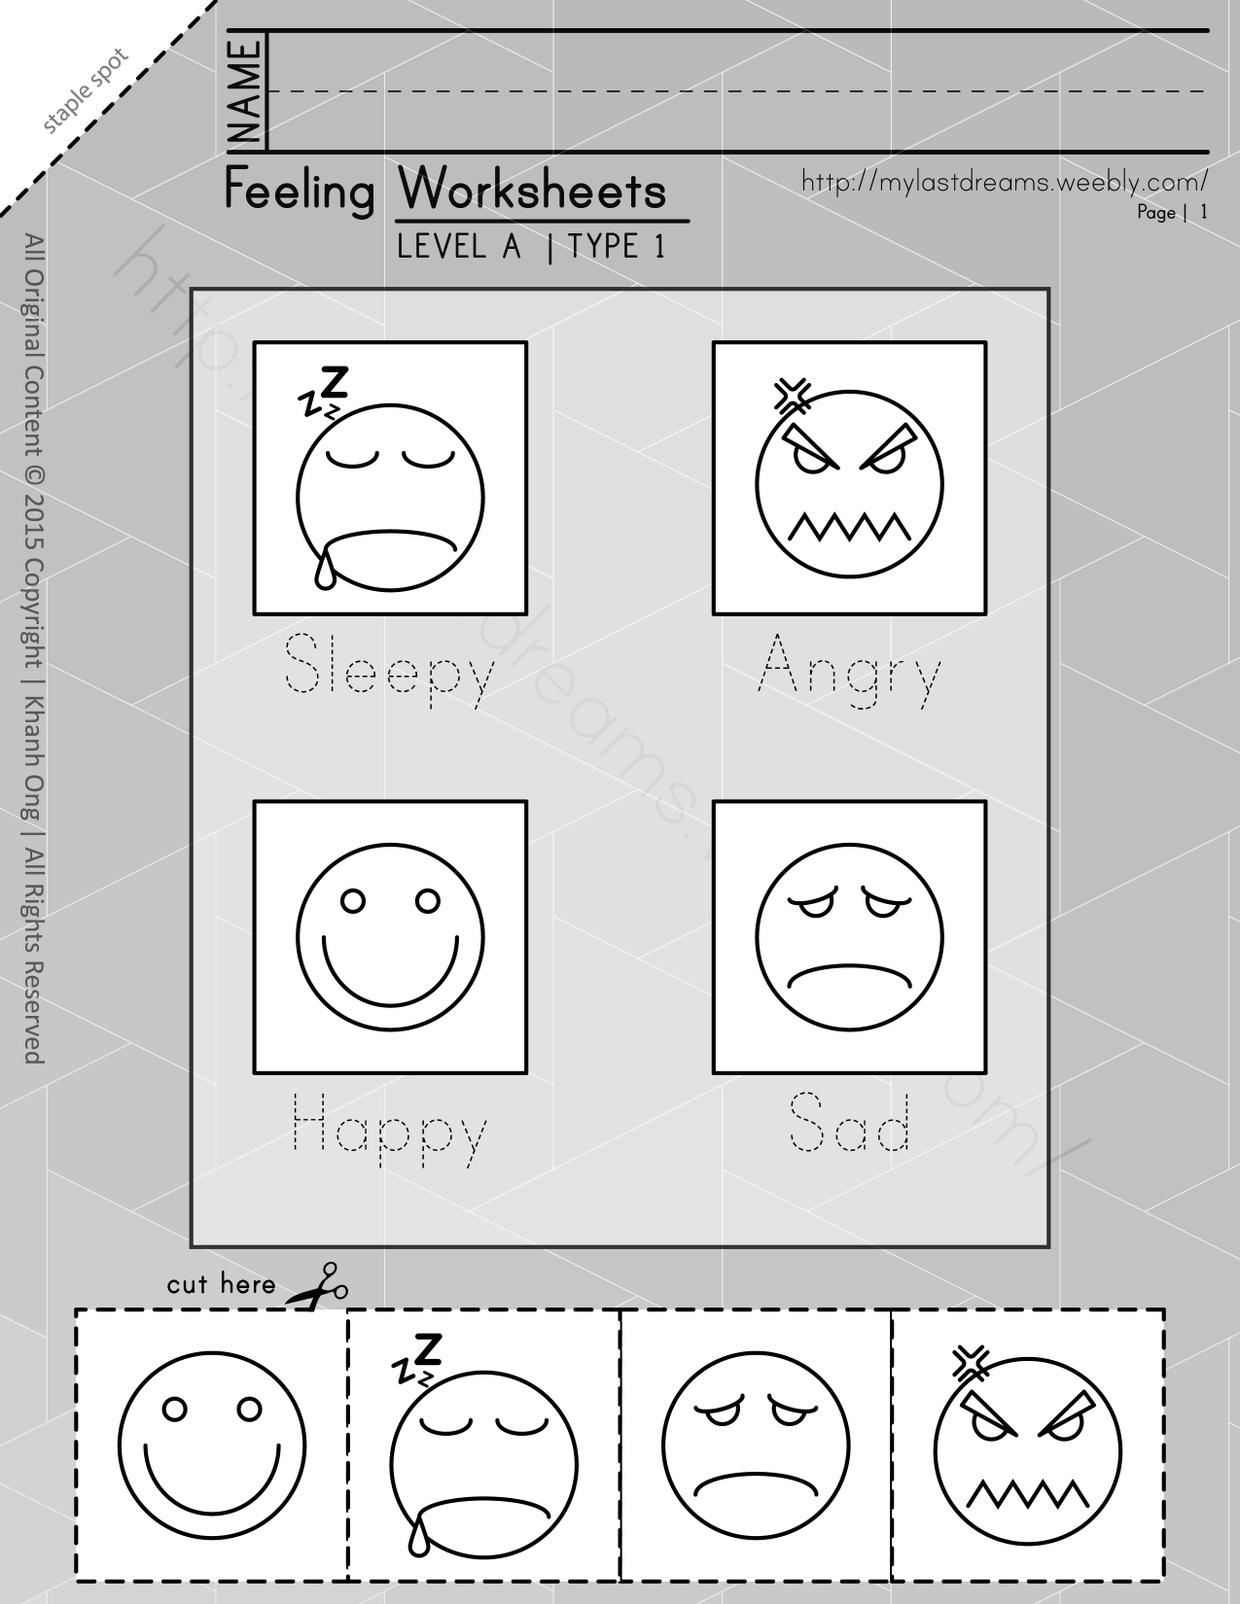 MLD - Basic Feeling Worksheets - Part 1 - Letter Sized